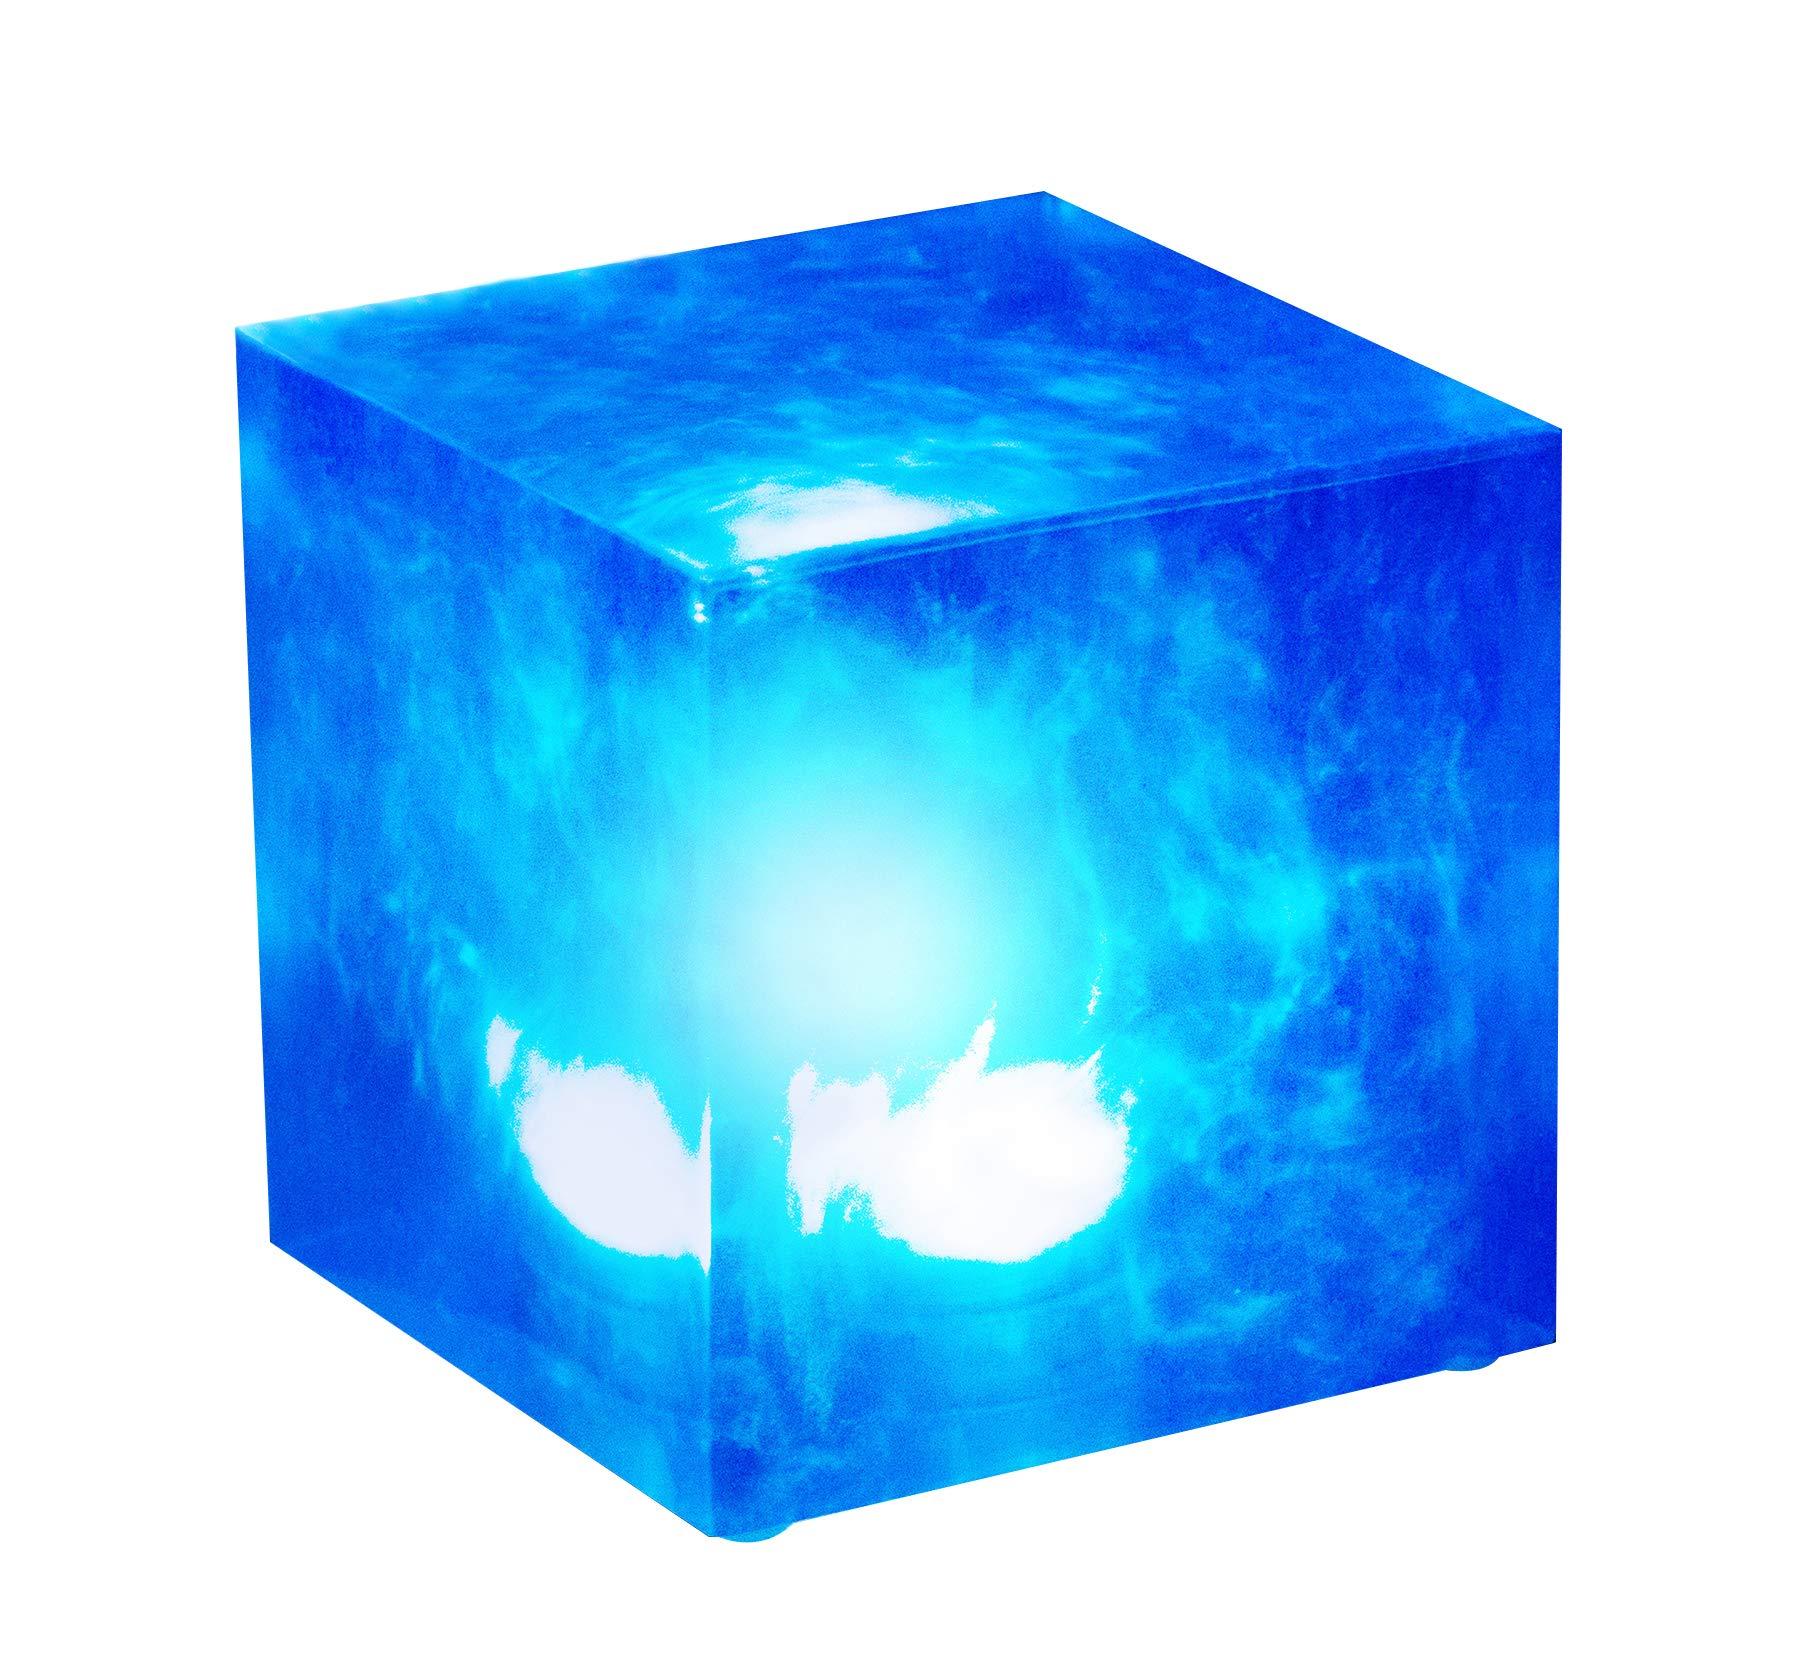 Tesseract Stone,Loki Cosplay,Loki Infinity Stones Tesseract Avengers Endgame Props Red by A&C Hero